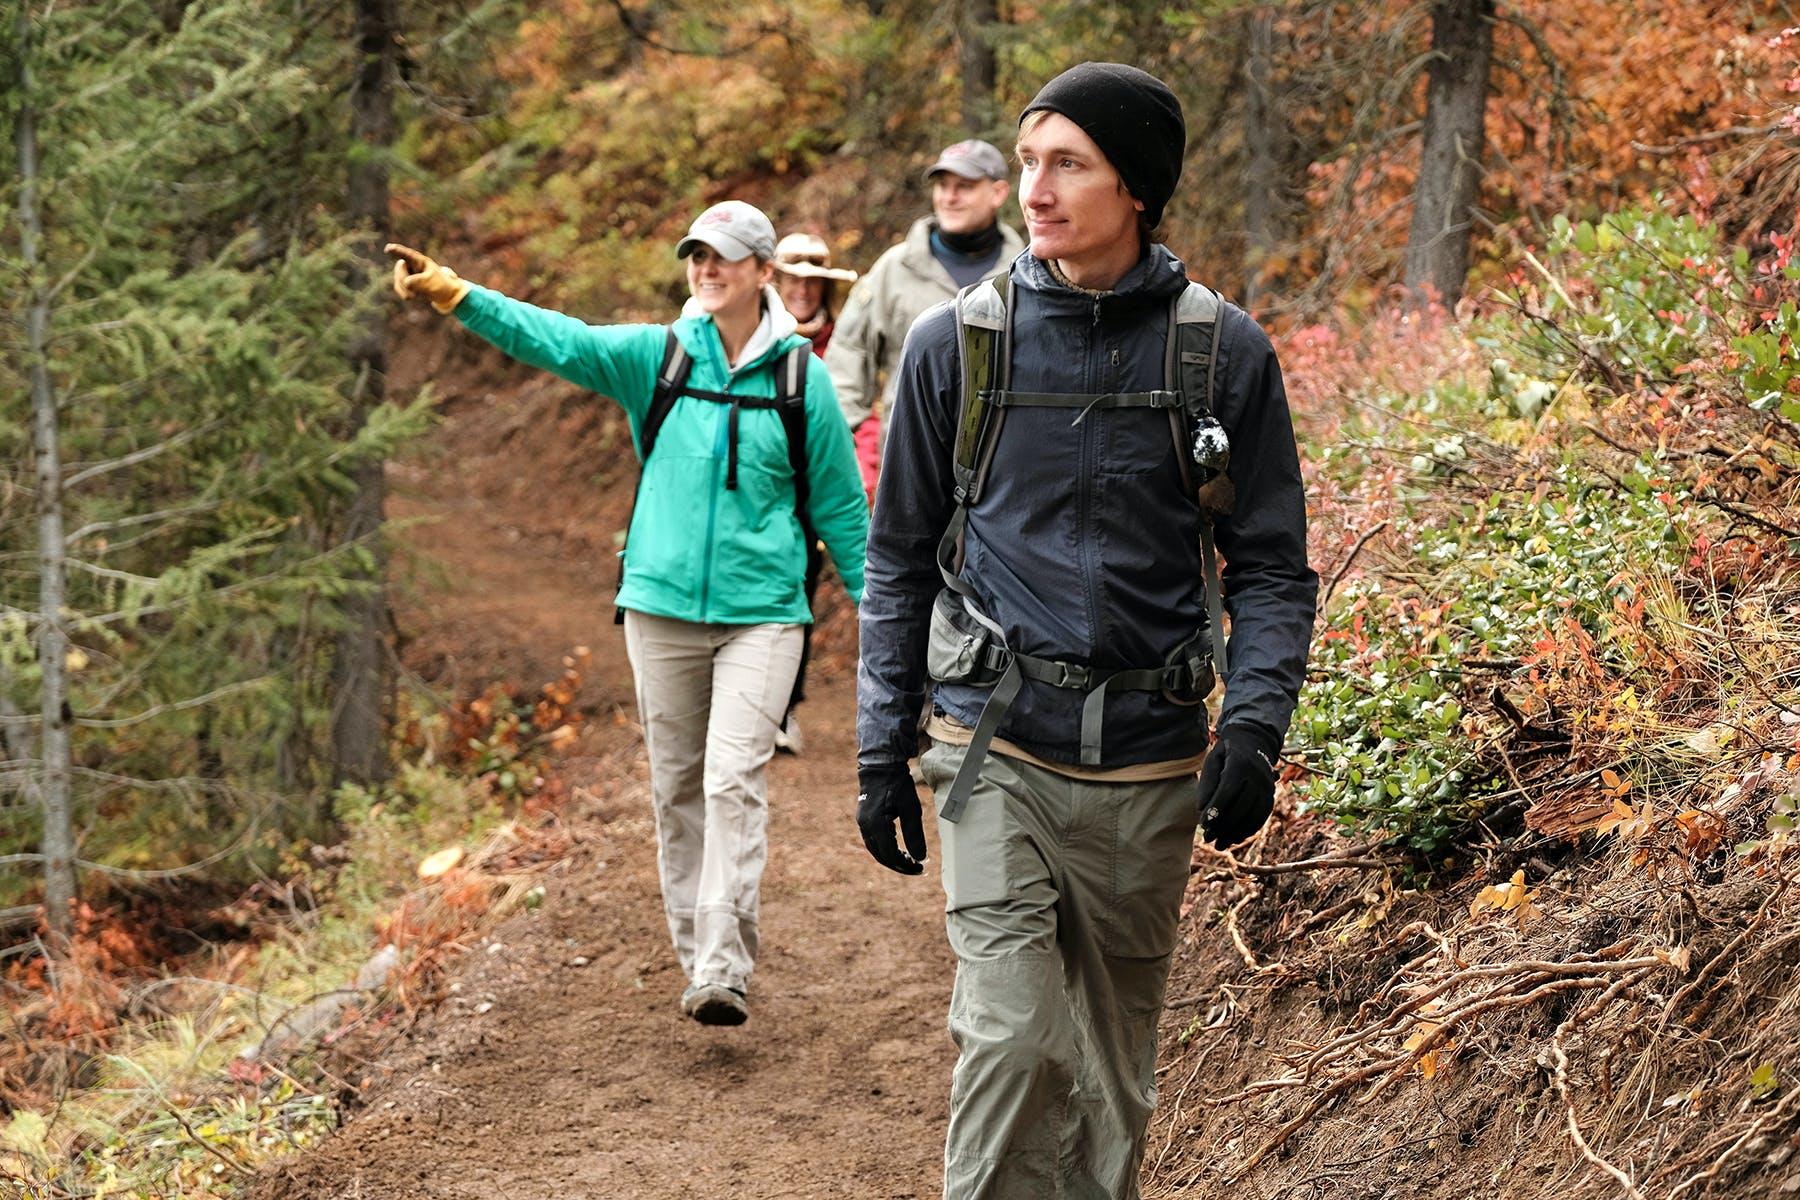 Enjoying the trail_by Geoff Sutton_courtesy of Five Valleys.jpg